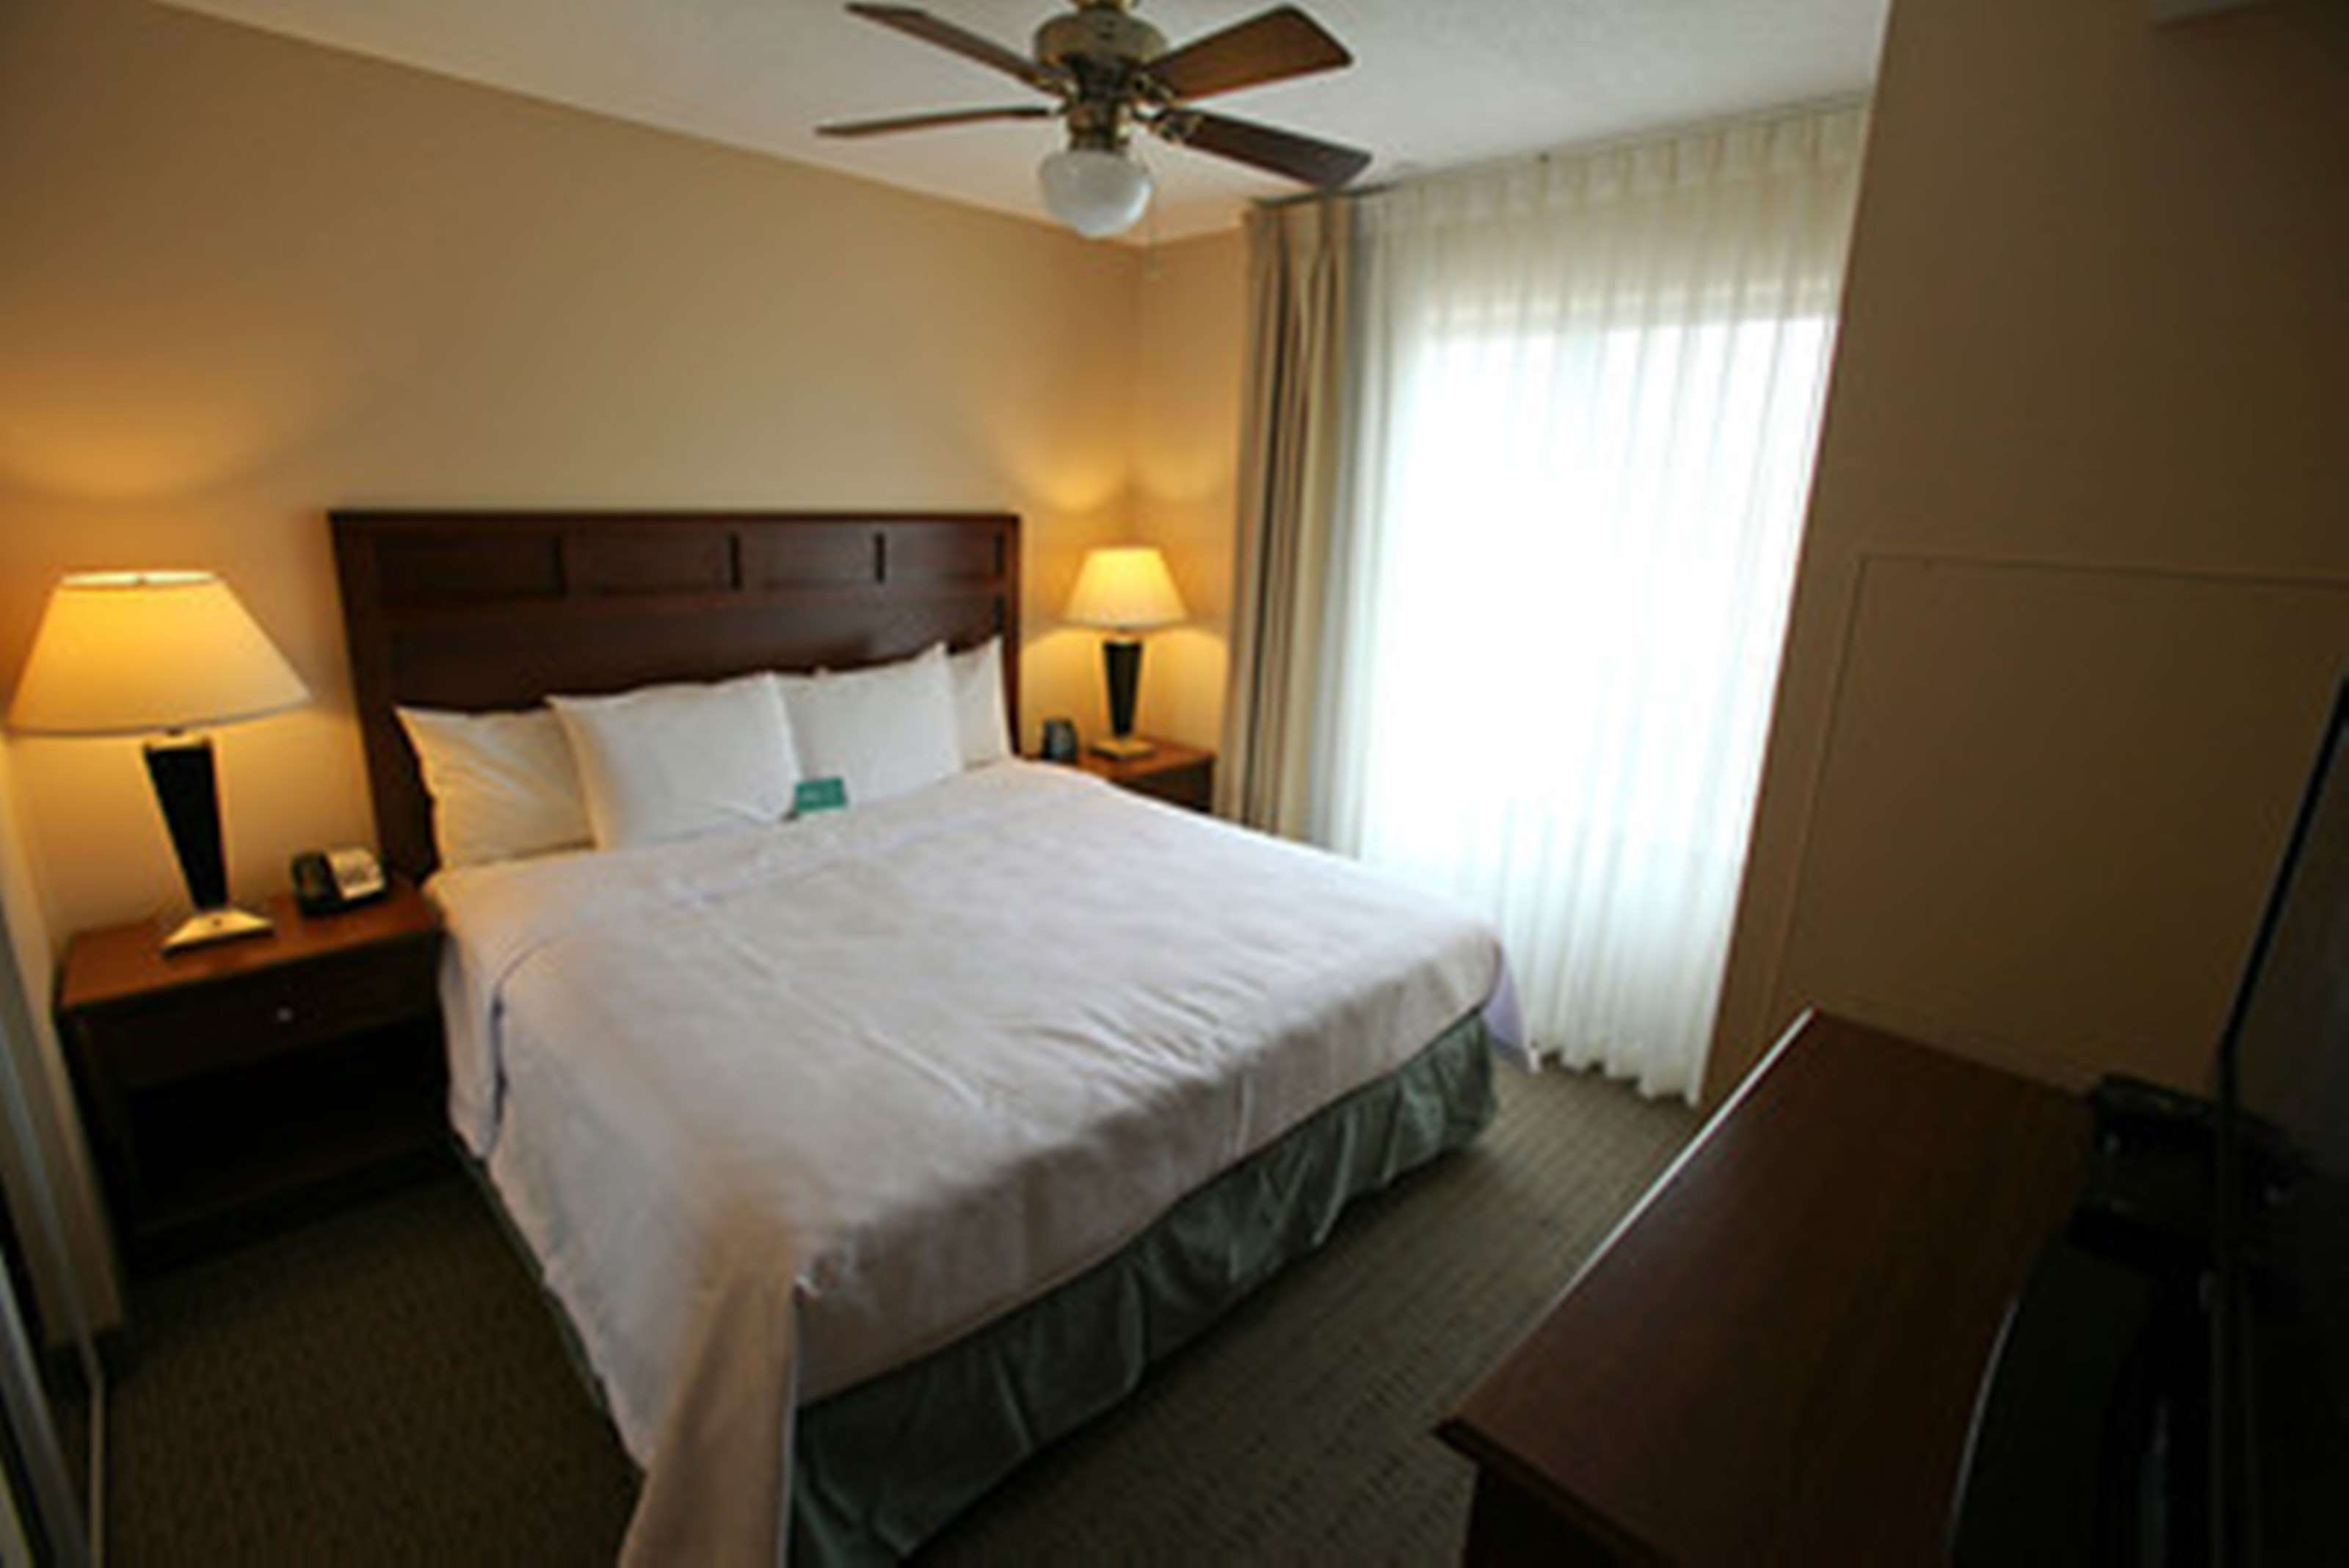 Homewood Suites by Hilton Orland Park image 20